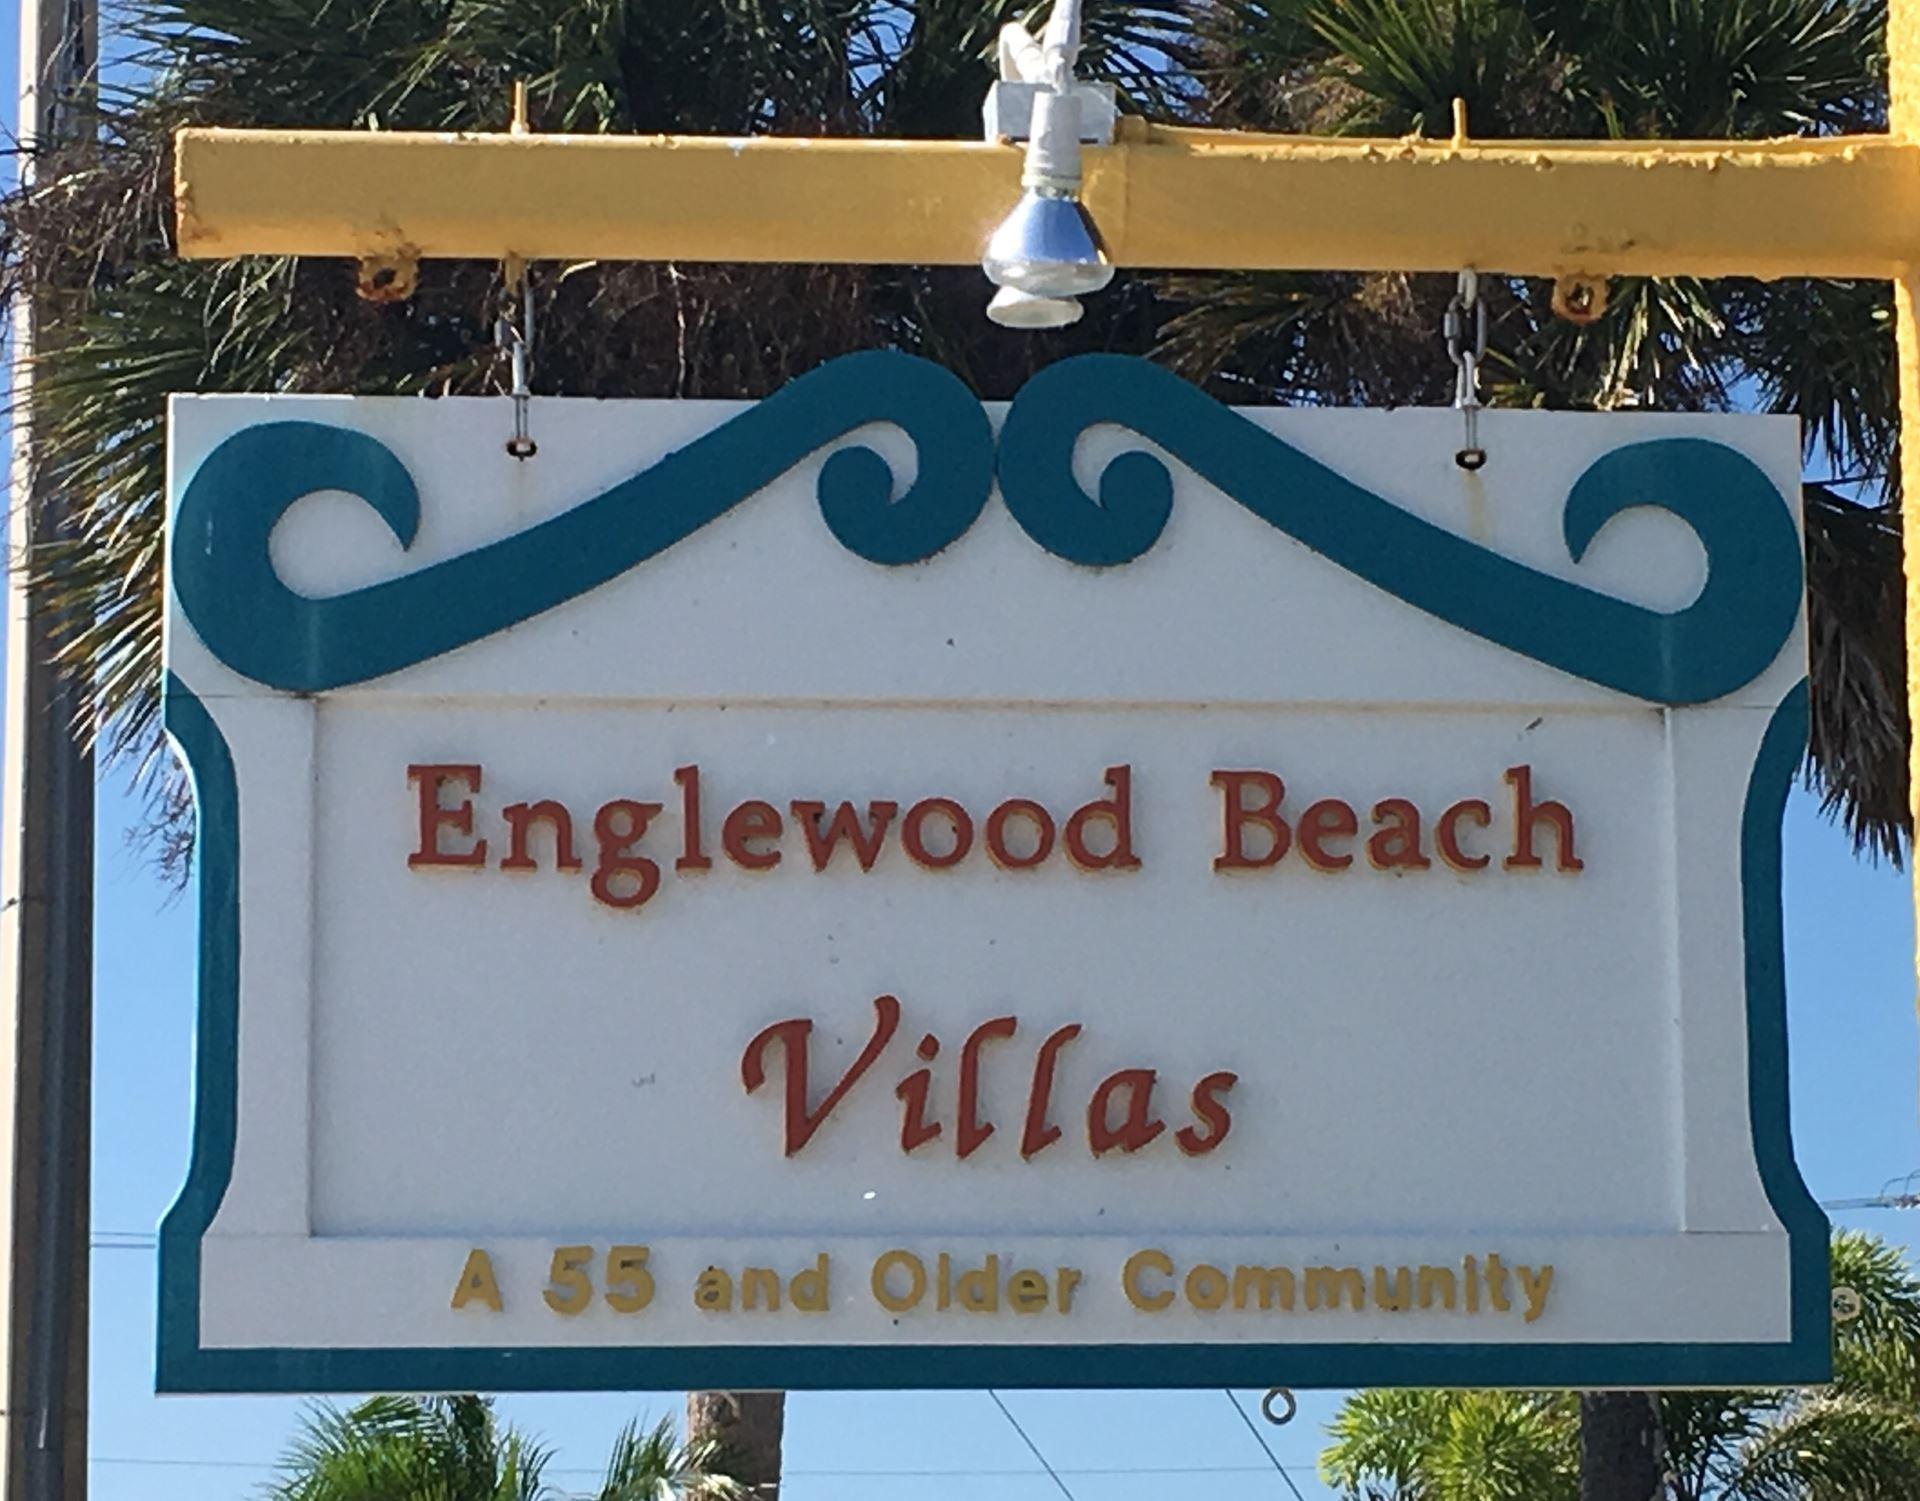 Englewood Beach Villas - Home Page